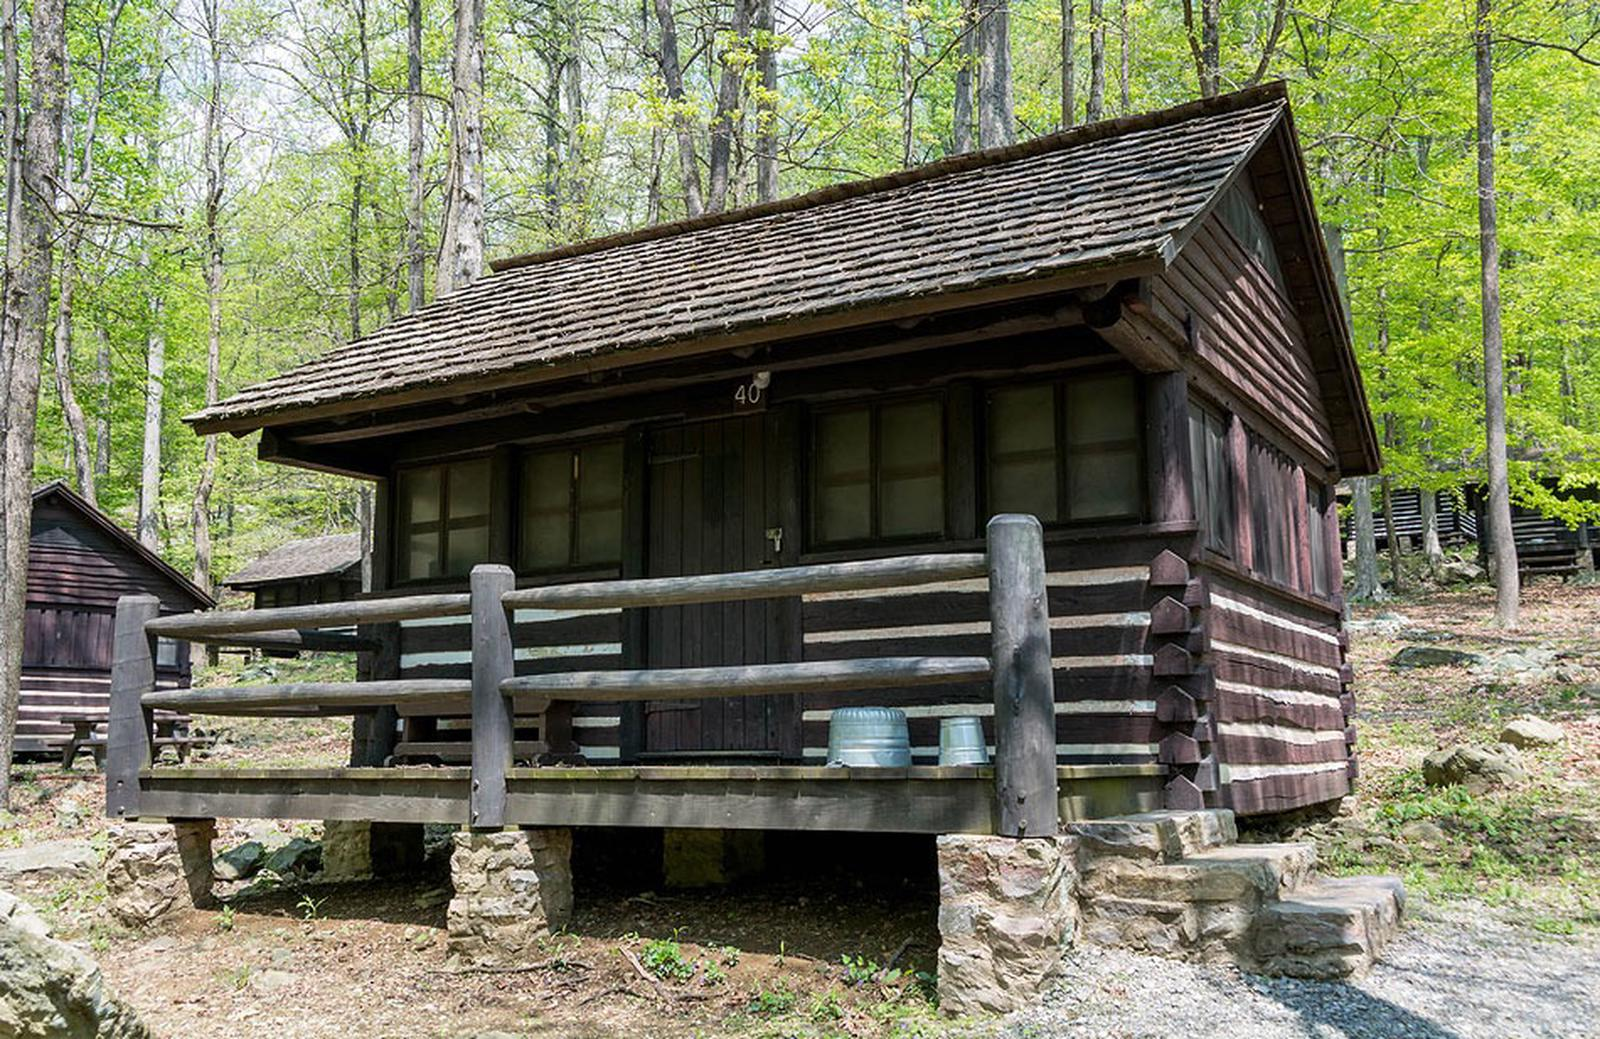 Camp Misty Mount Cabin 40